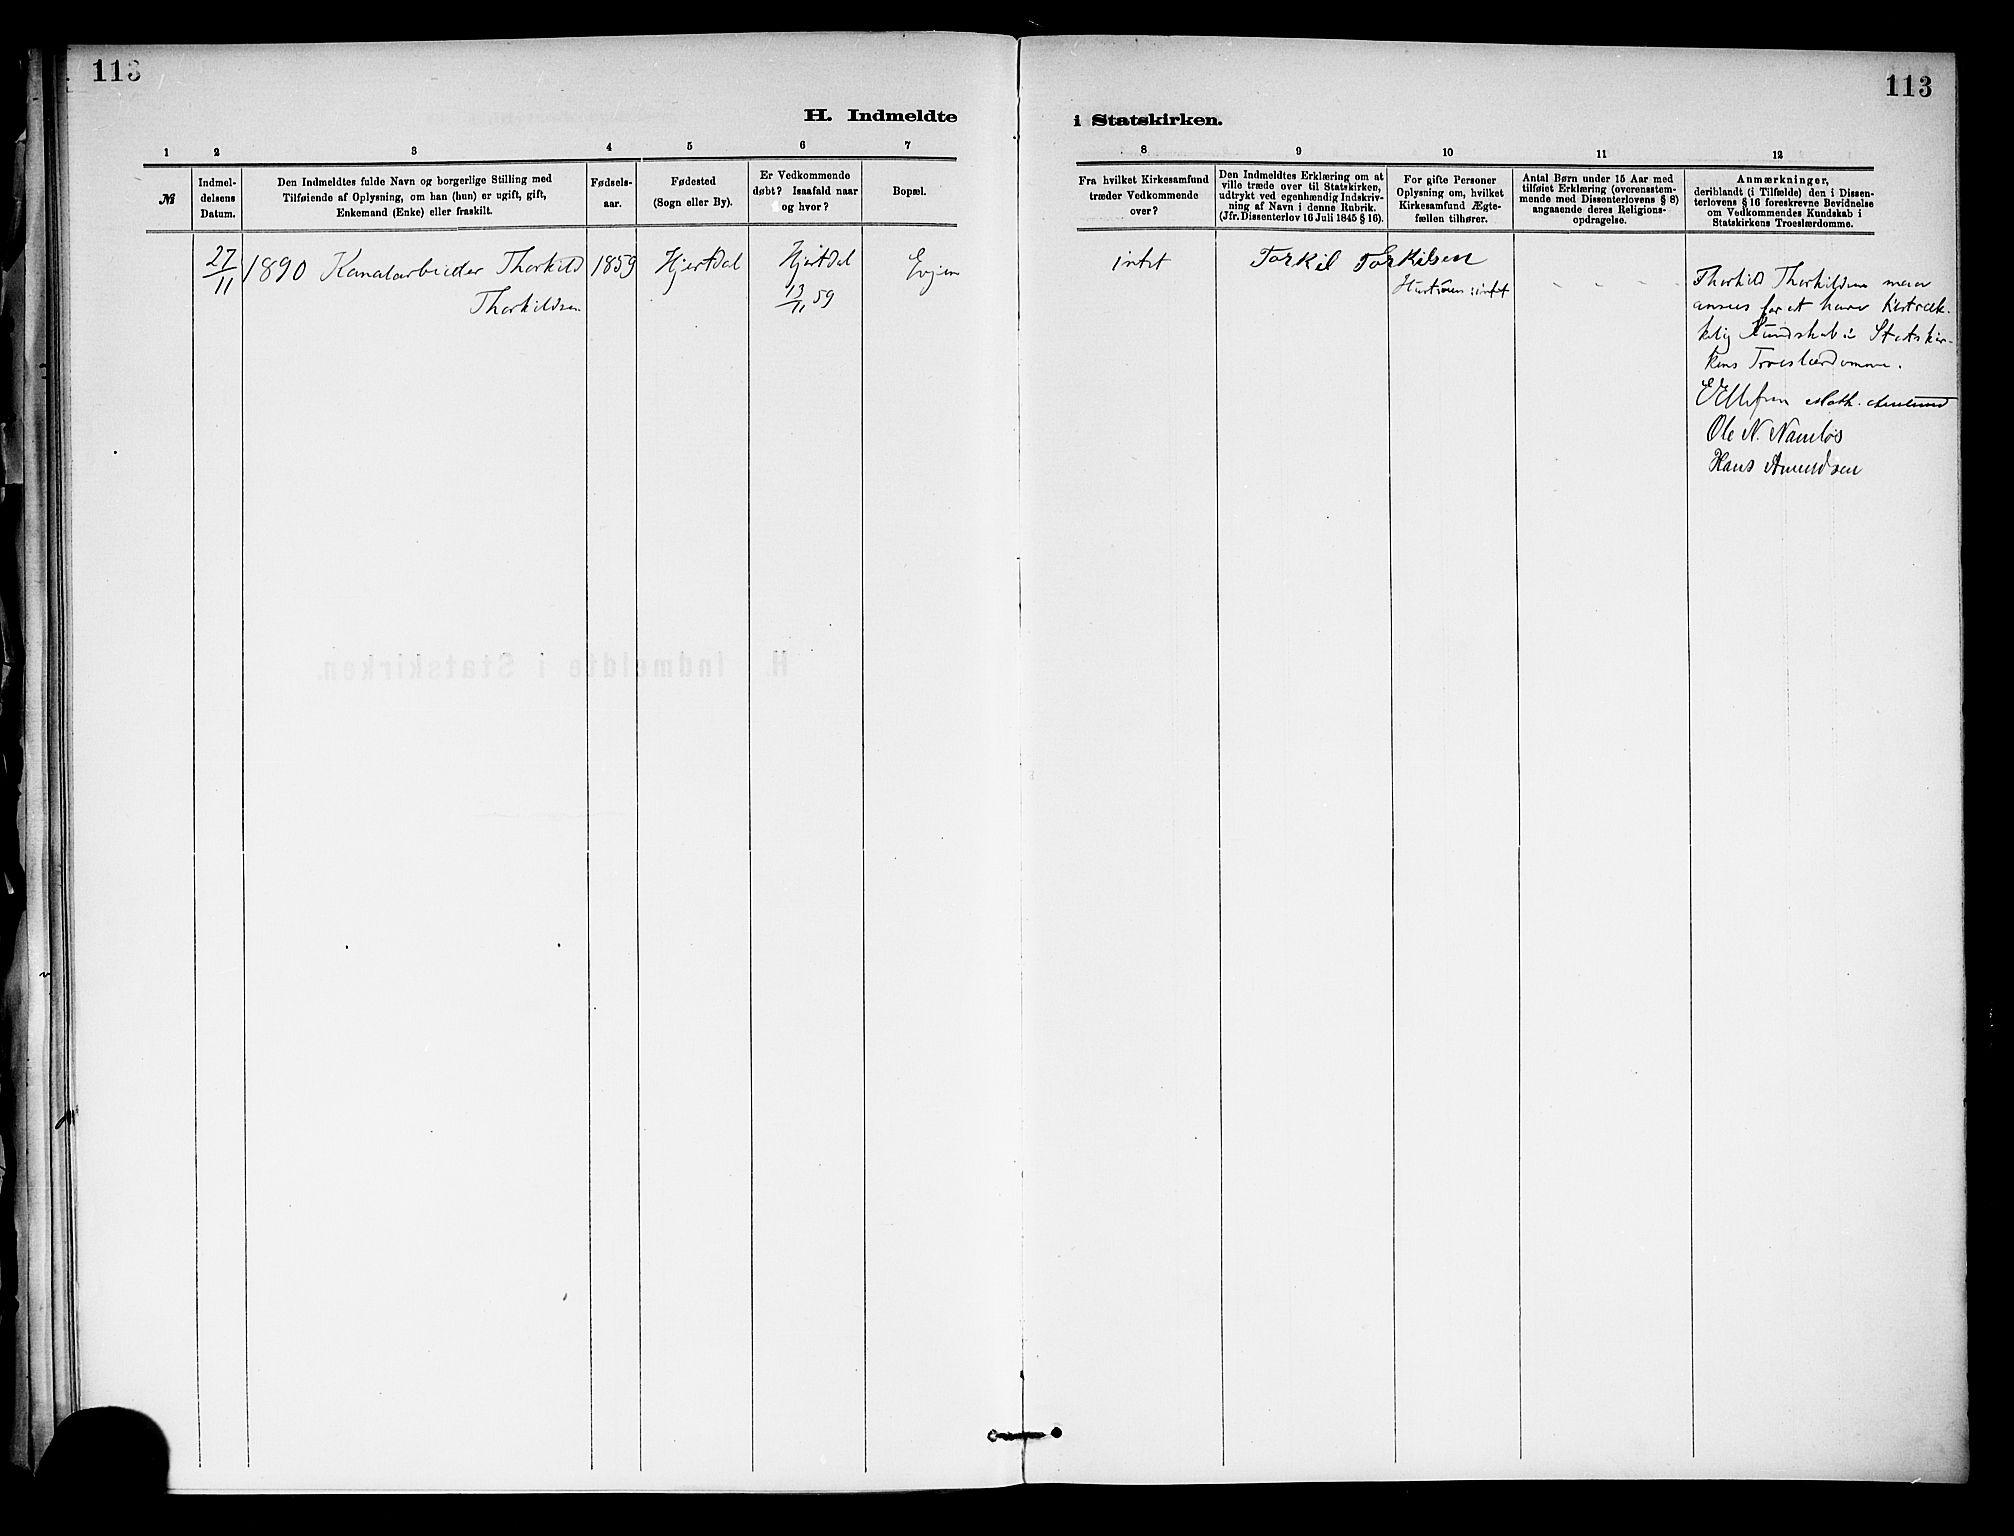 SAKO, Holla kirkebøker, F/Fa/L0009: Ministerialbok nr. 9, 1881-1897, s. 113